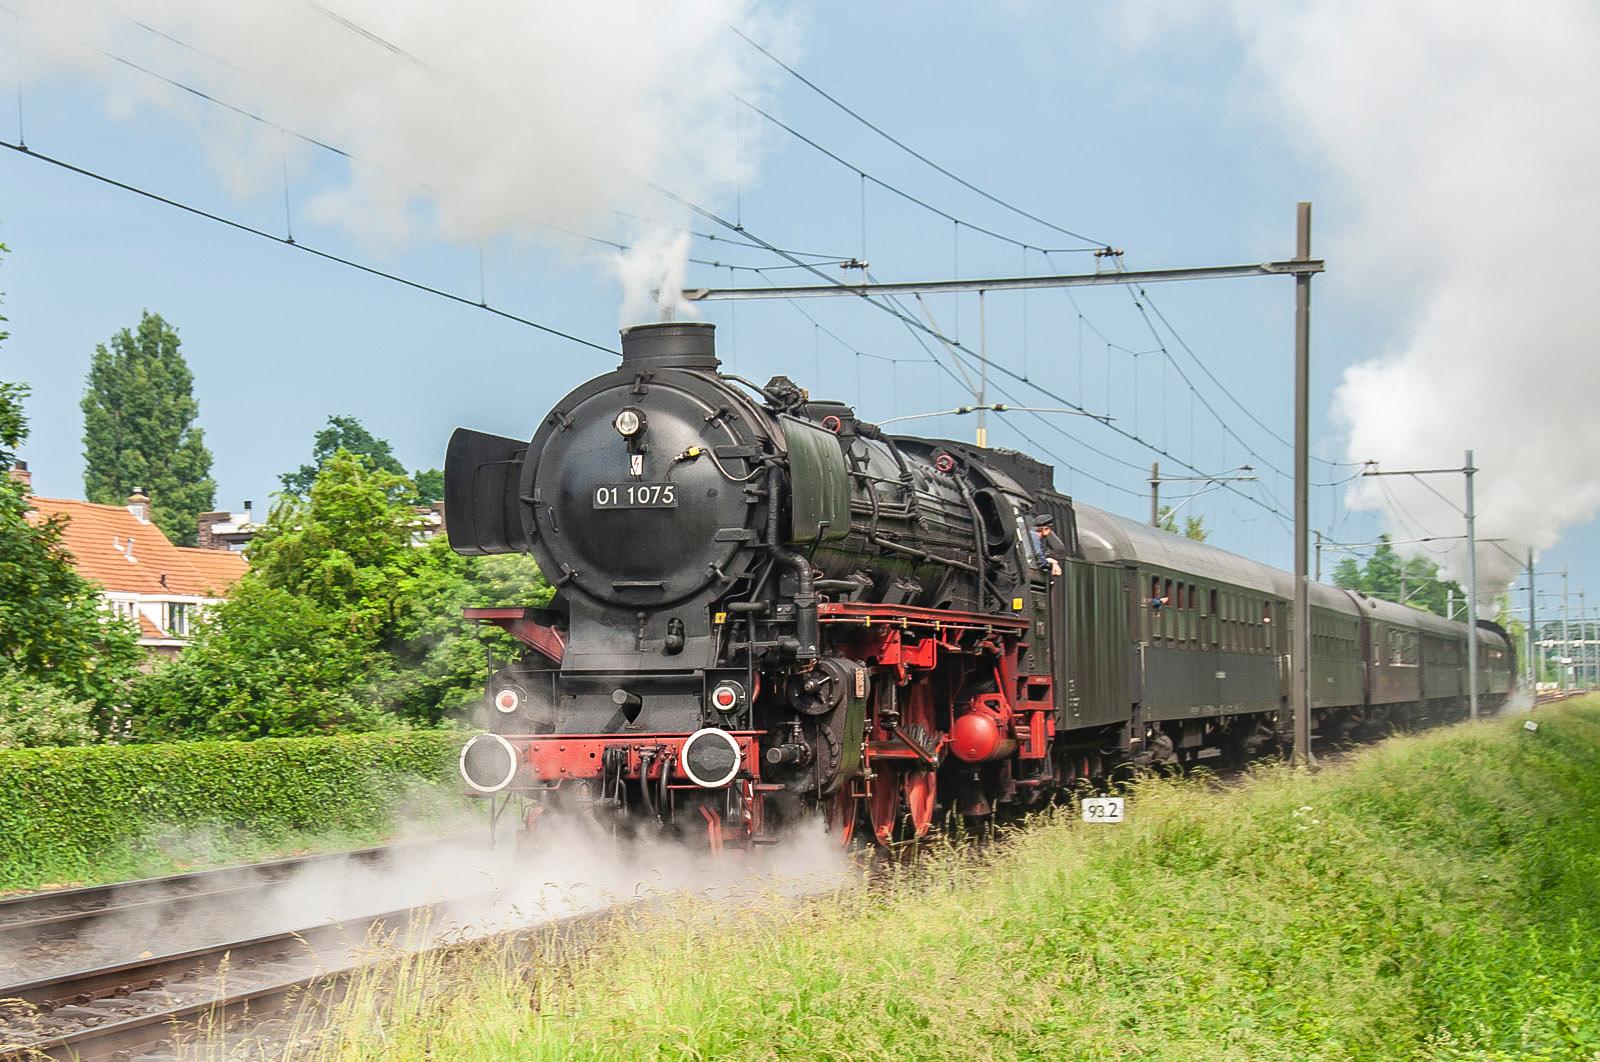 Dampfzug Dampflokomotive Nostalgie Eisenbahn